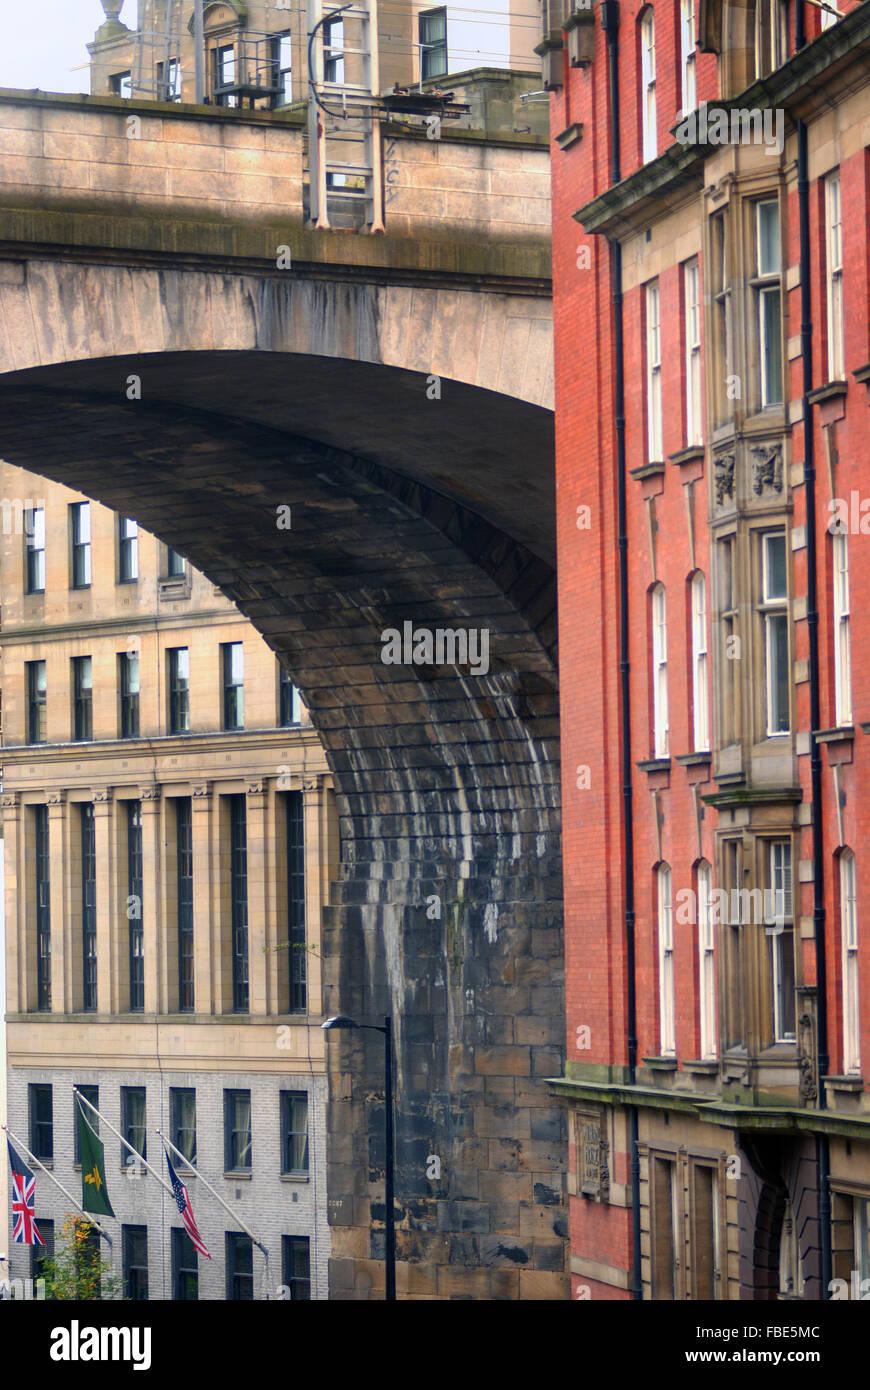 Dean Street, Newcastle upon Tyne - Stock Image